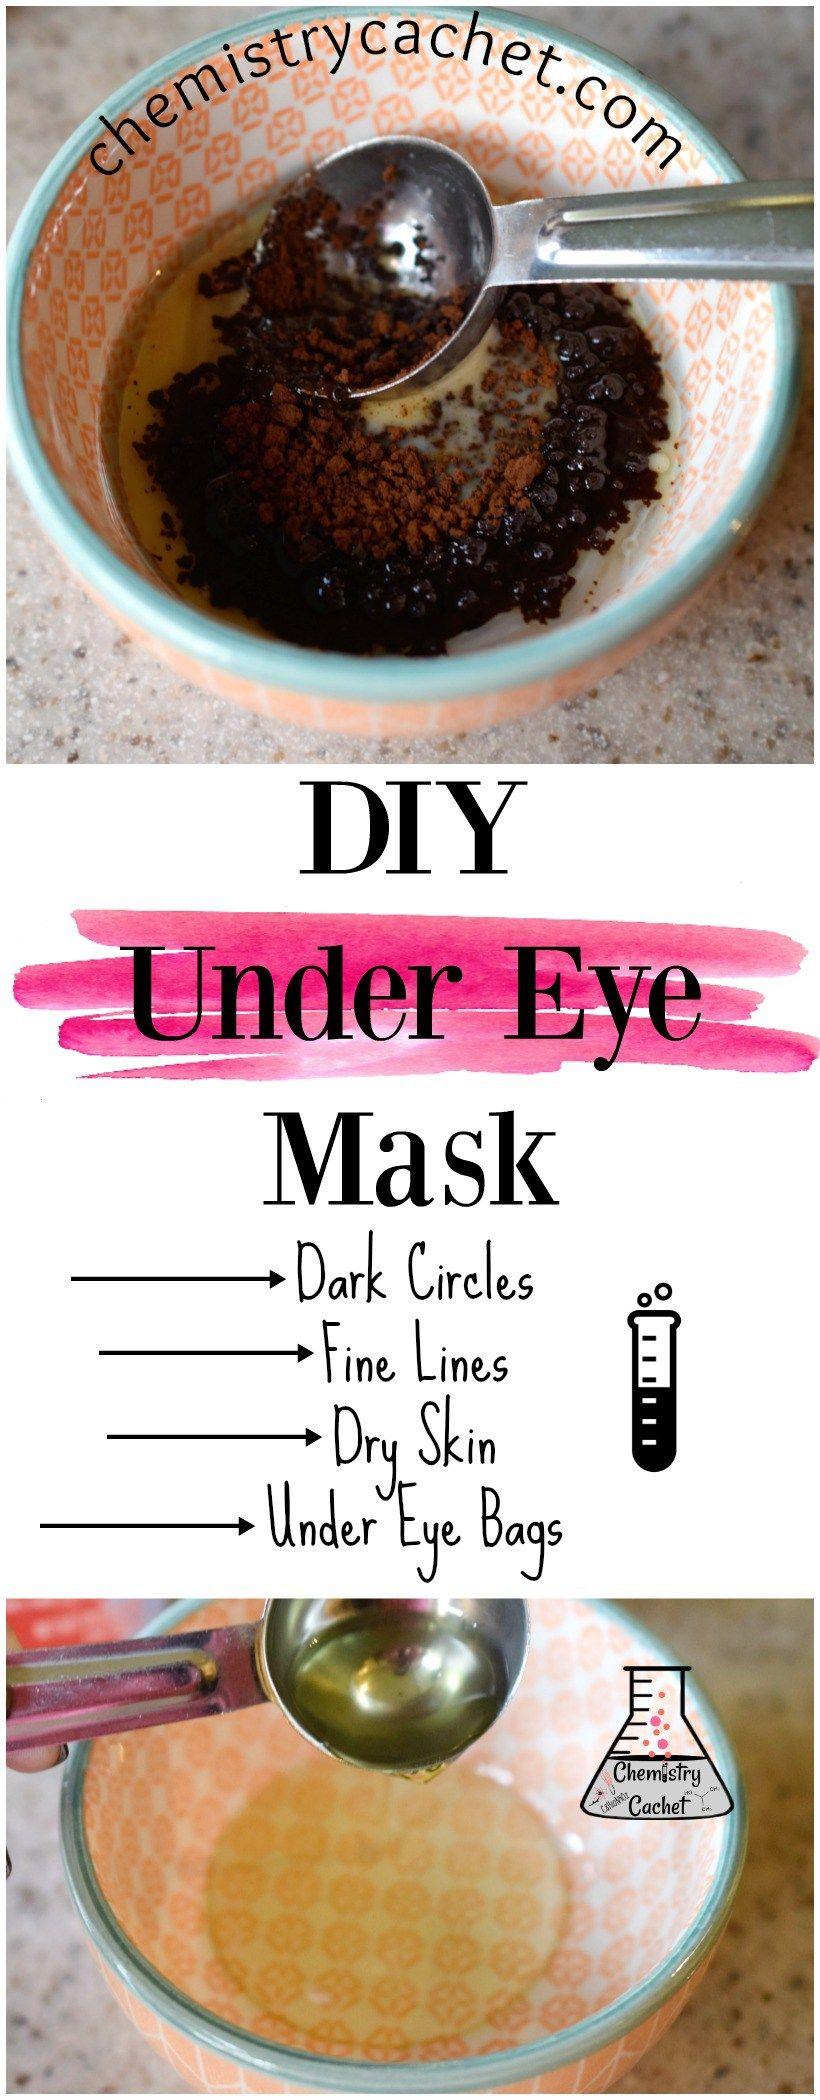 DIY Under Eye Mask for Dark Circles, Under Eye Bags, and